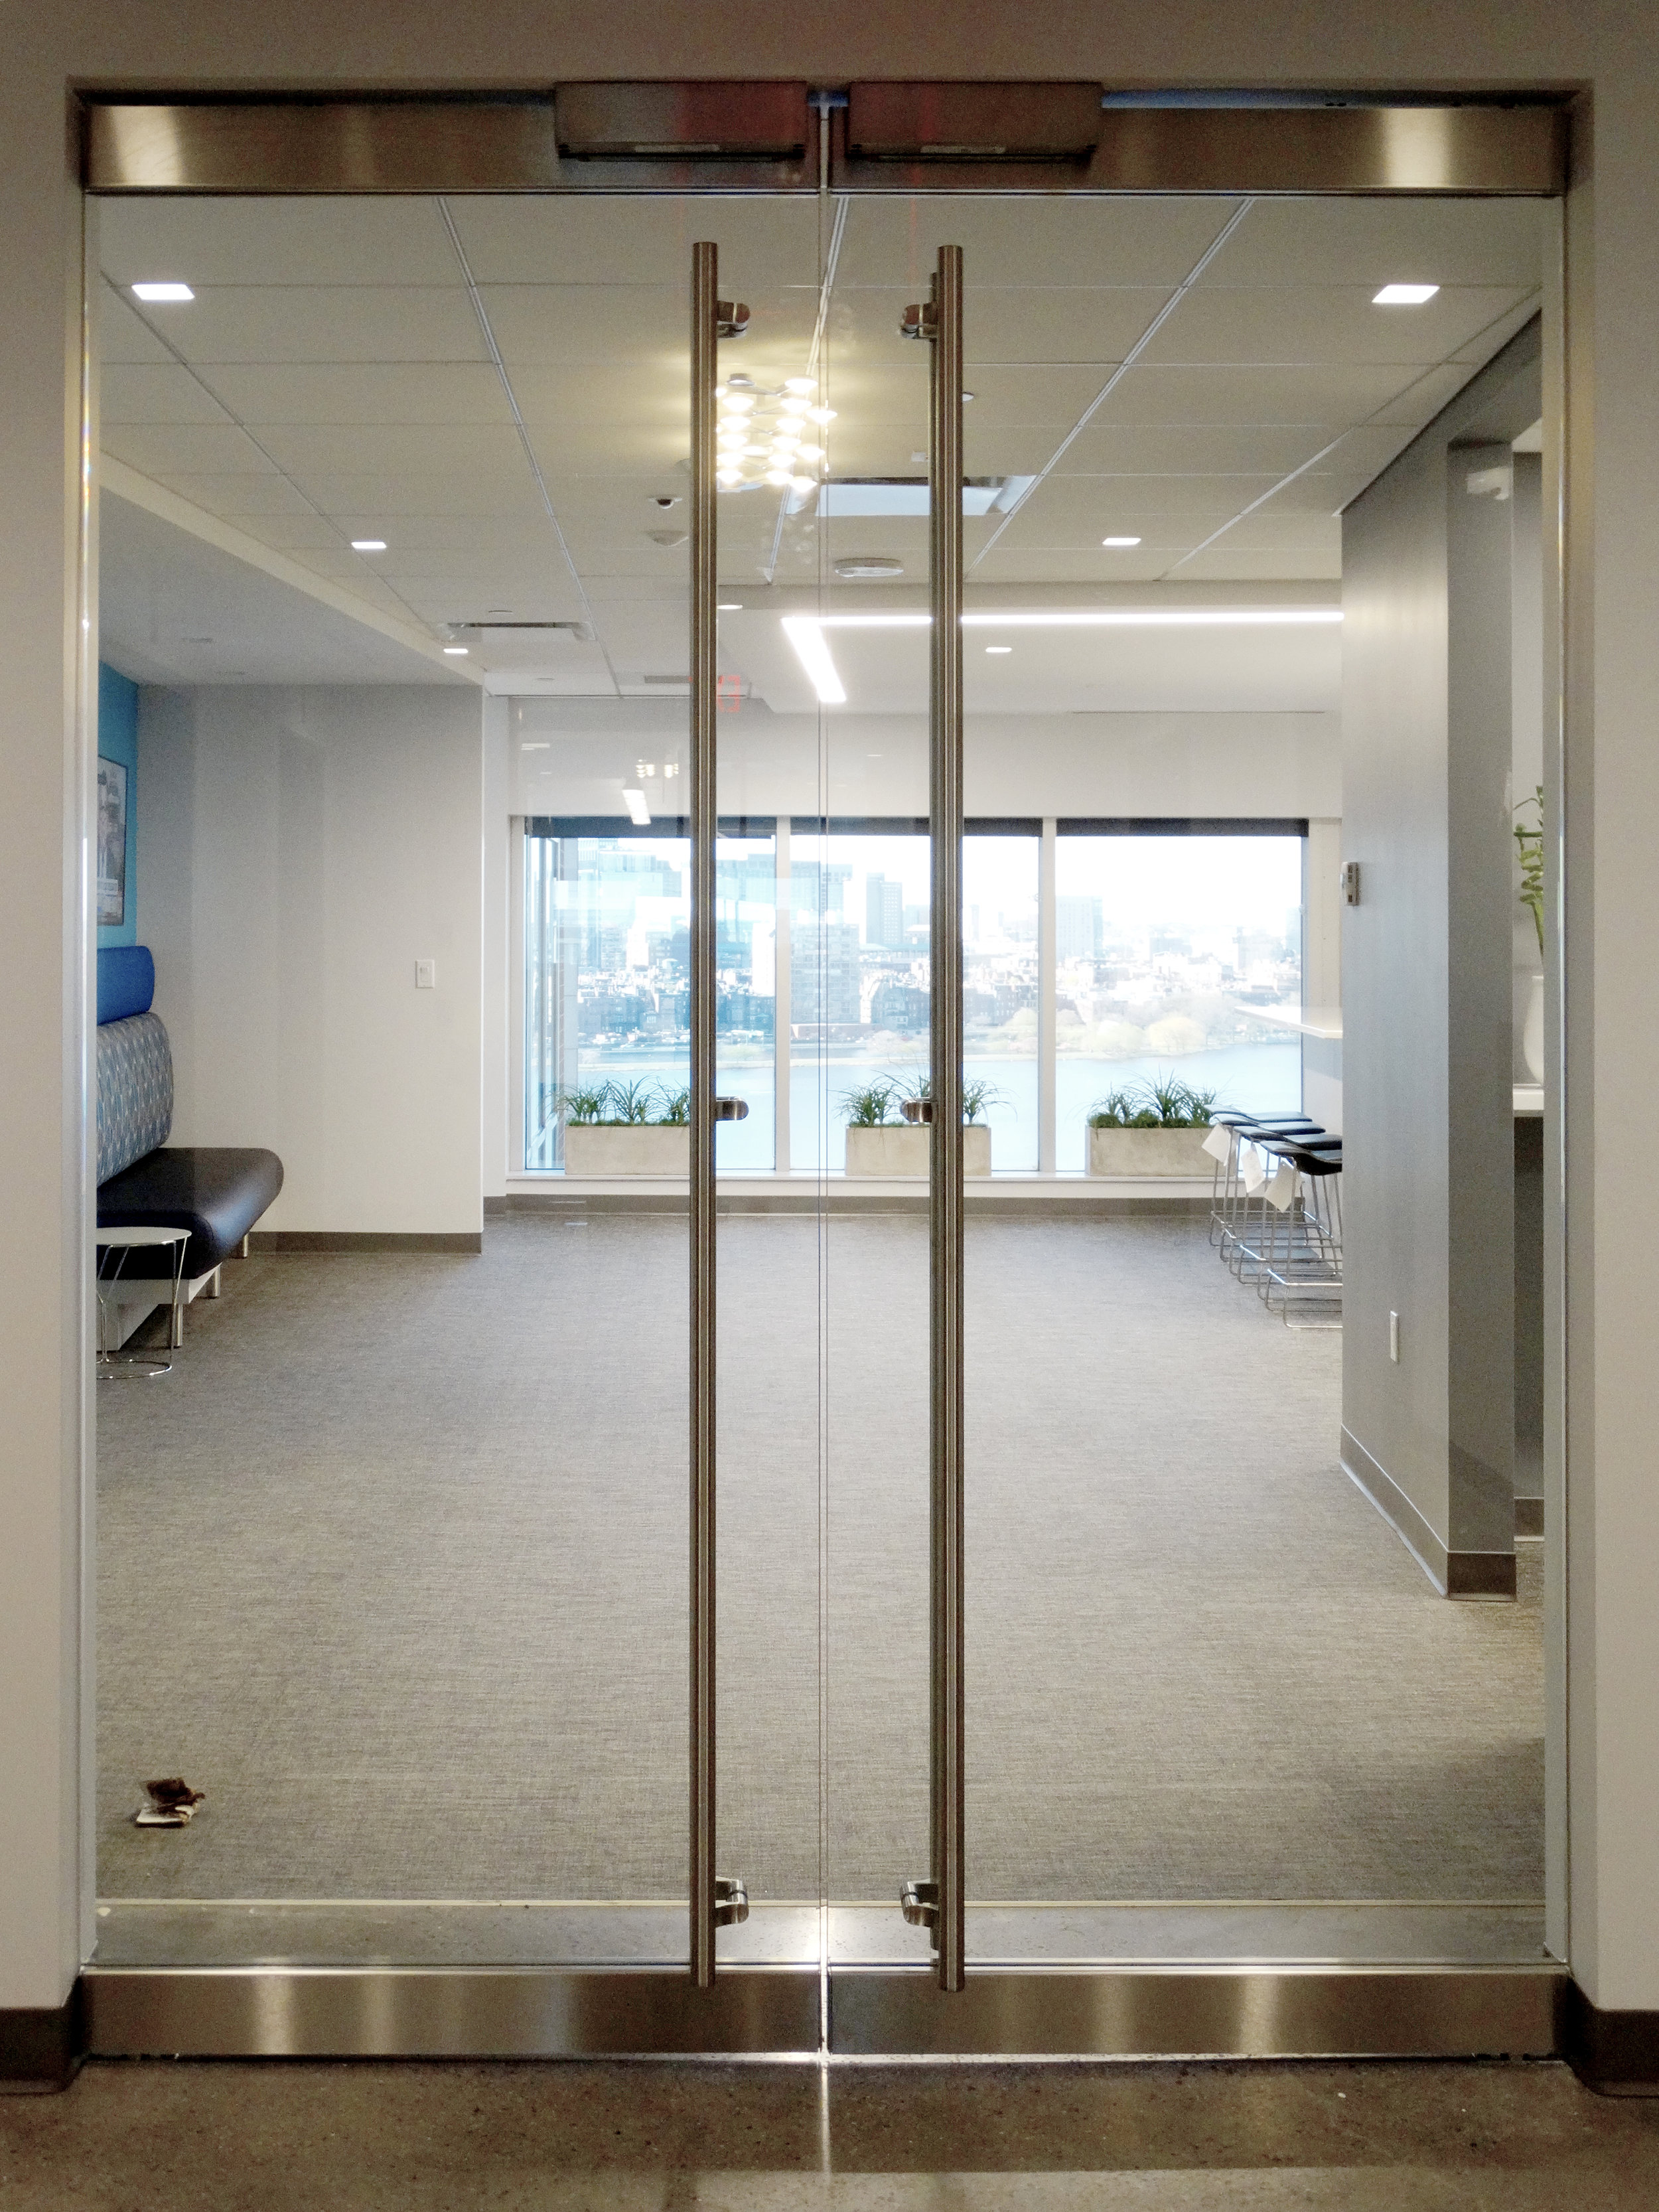 Illume Frameless Glass Rail Doors Offset Ladder Pulls Maglock - Spaceworks AI.jpg